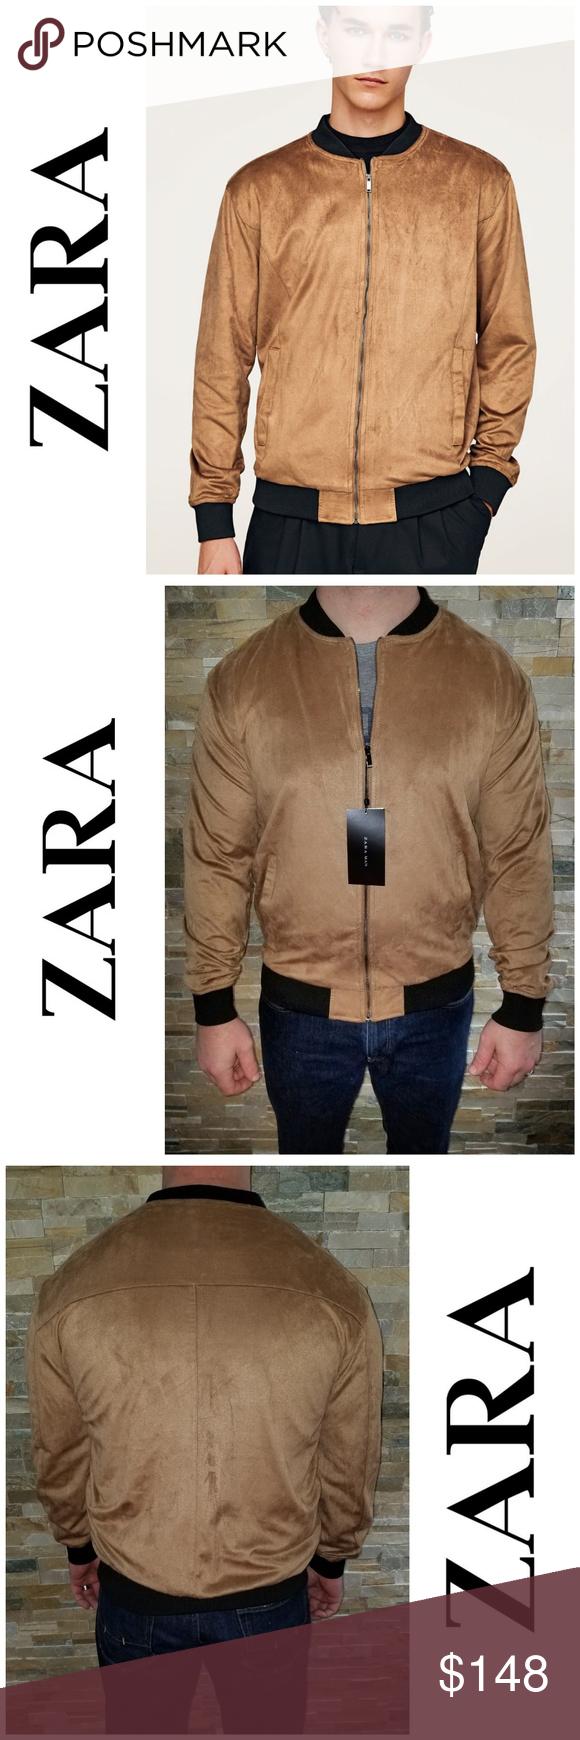 Nwt Zara Man Faux Suede Zip Up Bomber Jacket Bomber Jacket Zara Man Suede Bomber Jacket